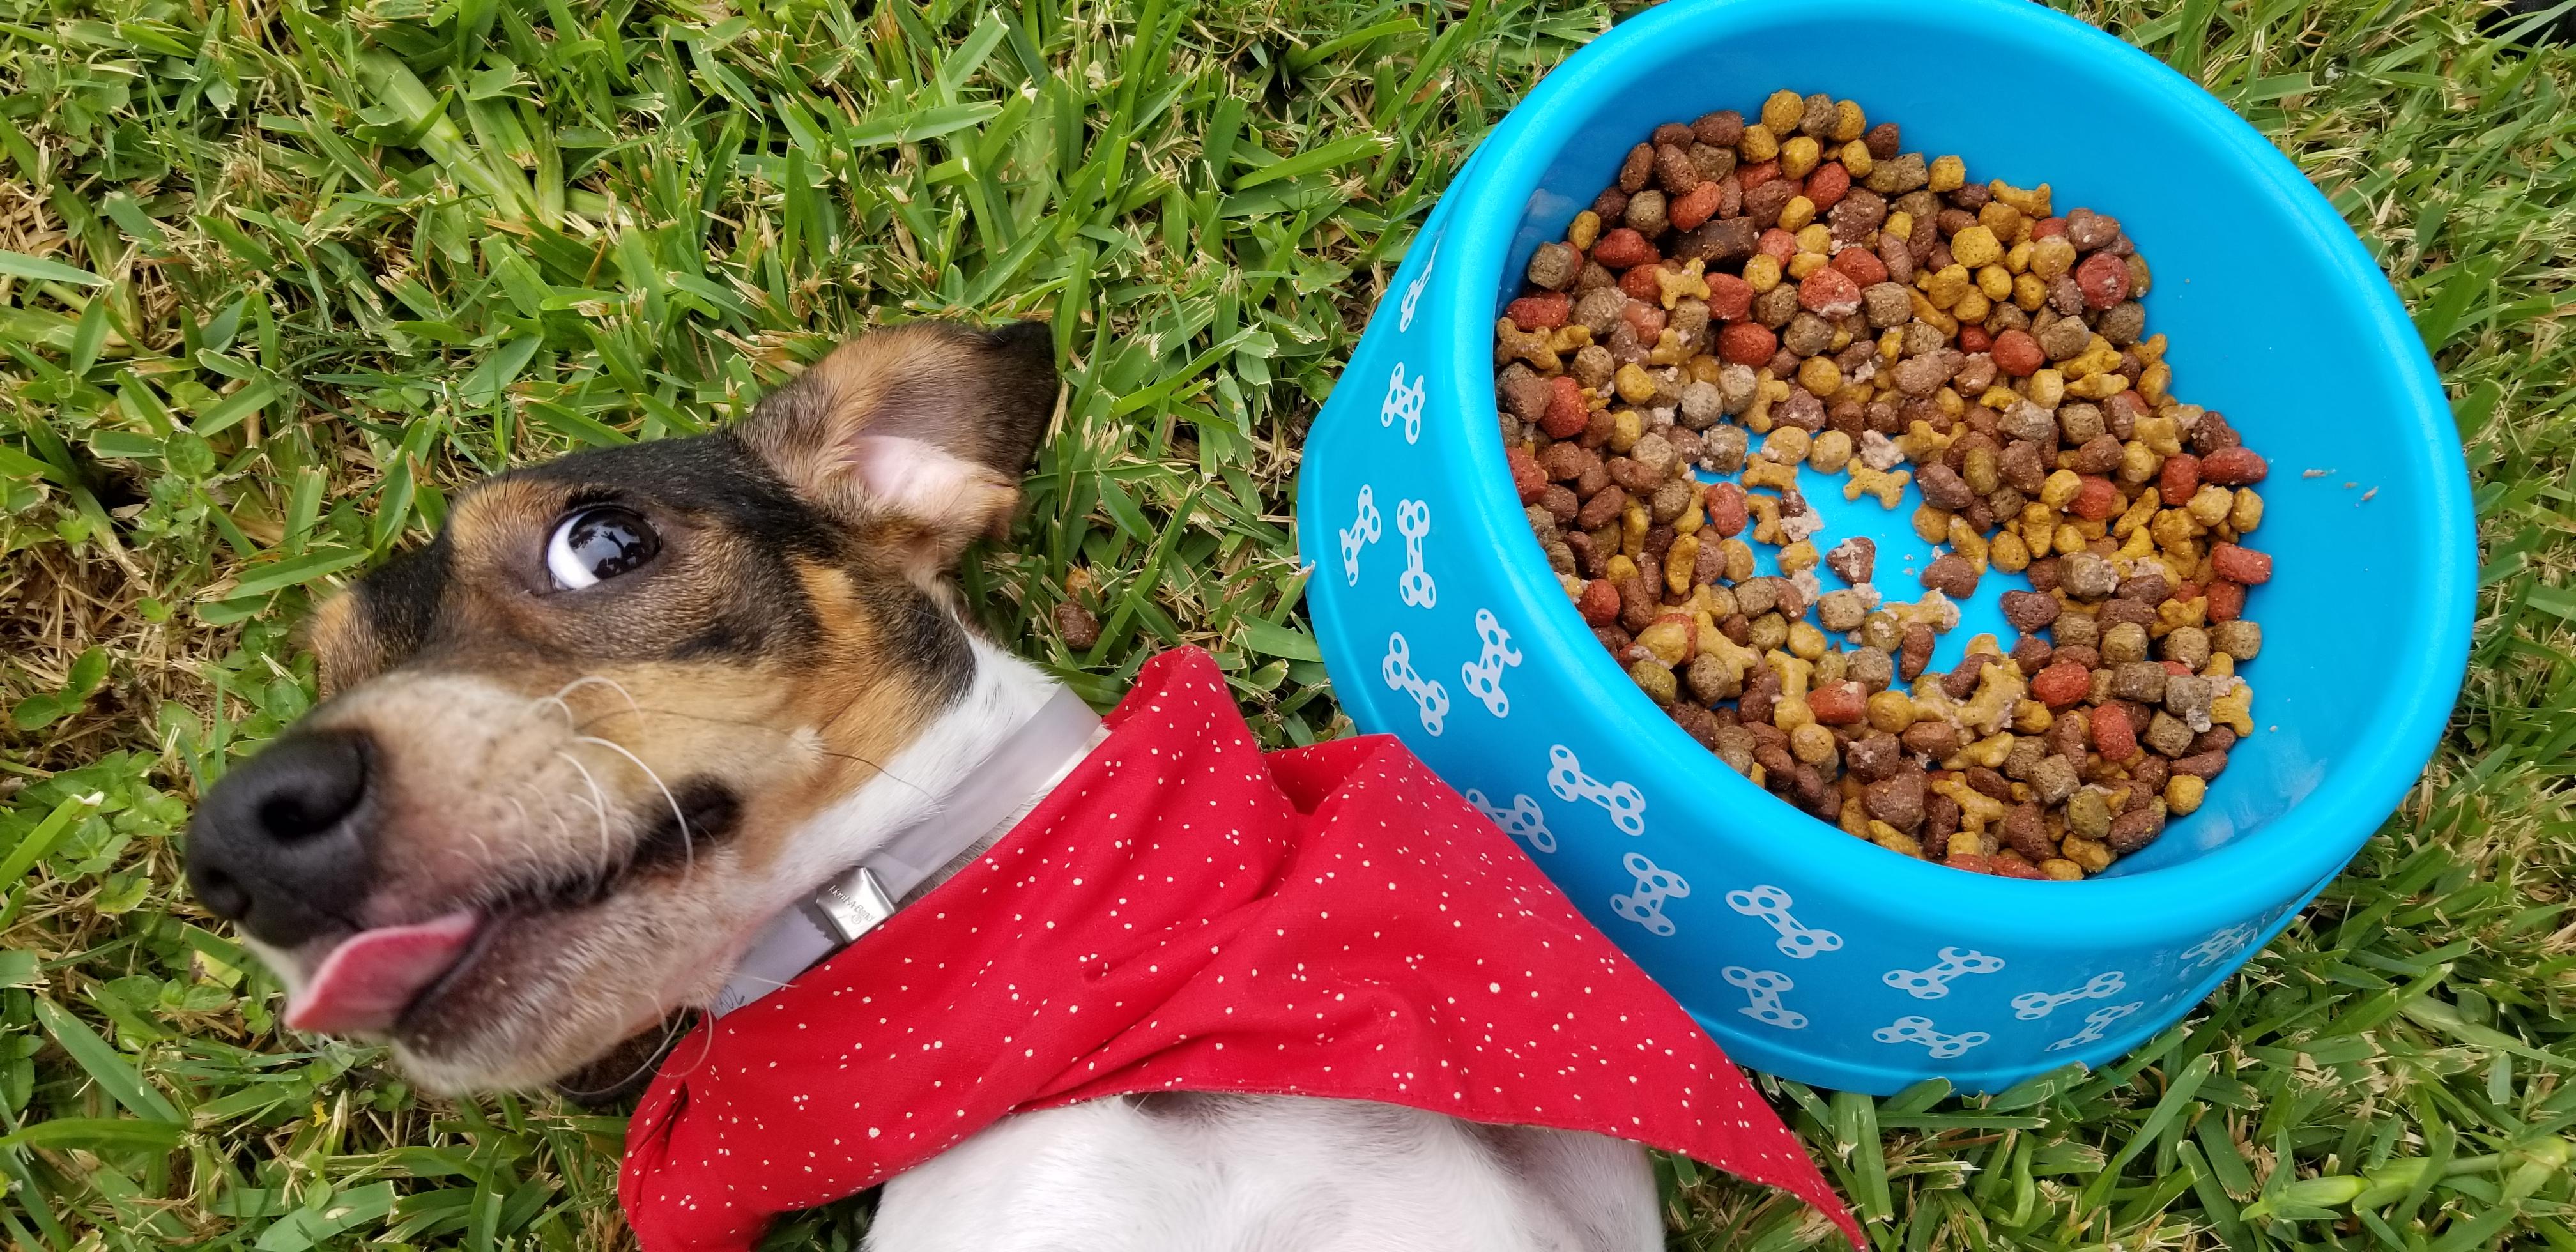 Alice on Grass with Food Bowl 6_©Houston Humane Society_NFARPW 2020-1